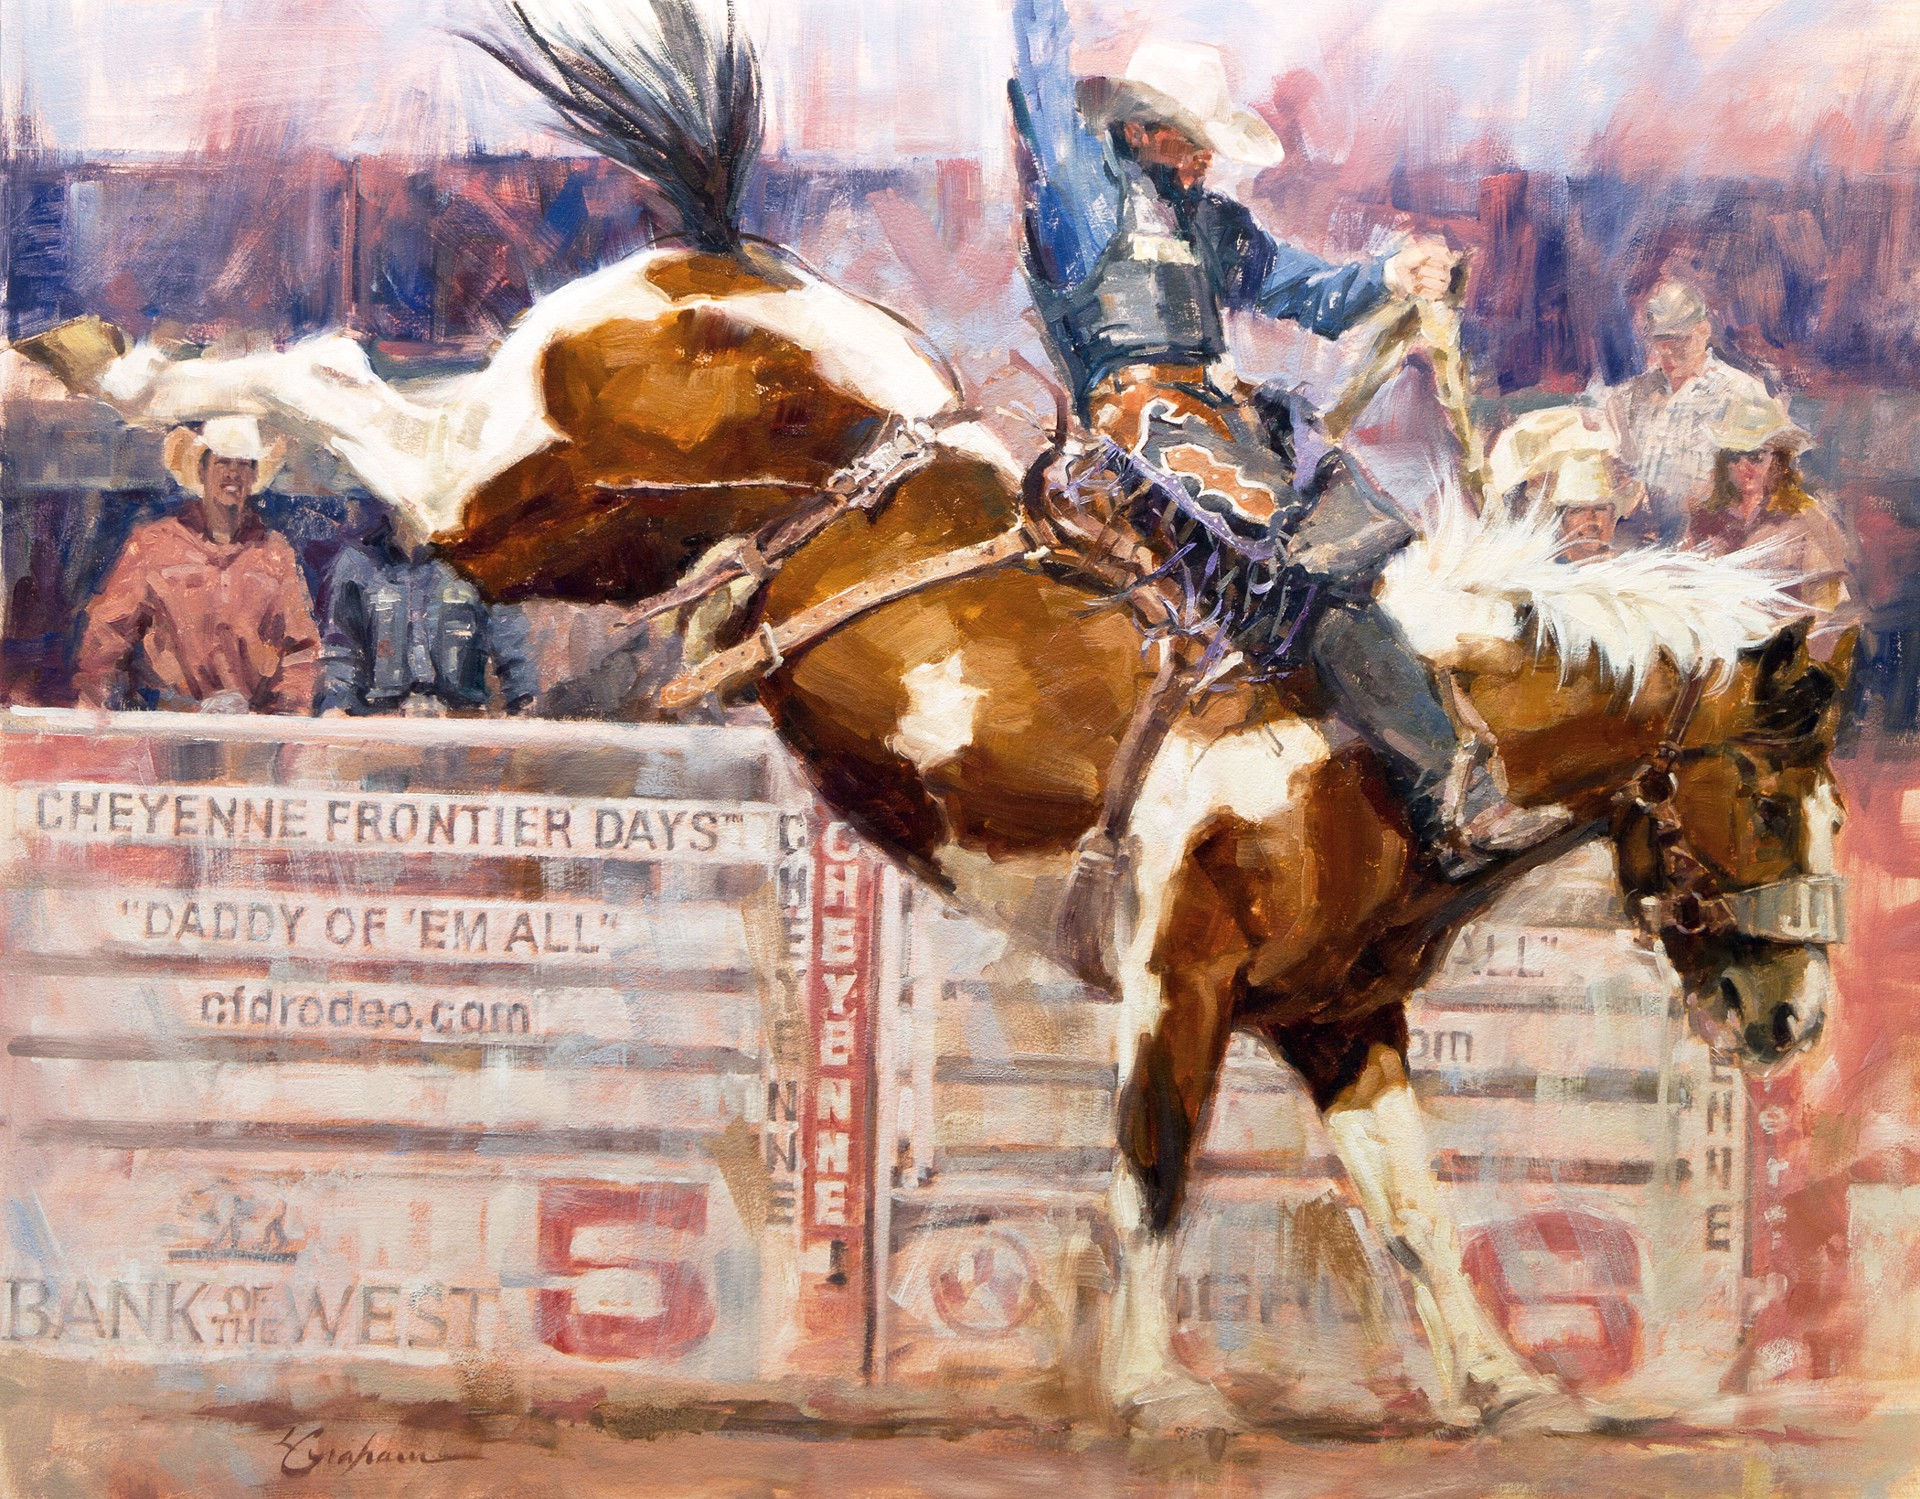 High Kickin' Paint by Lindsey Bittner Graham